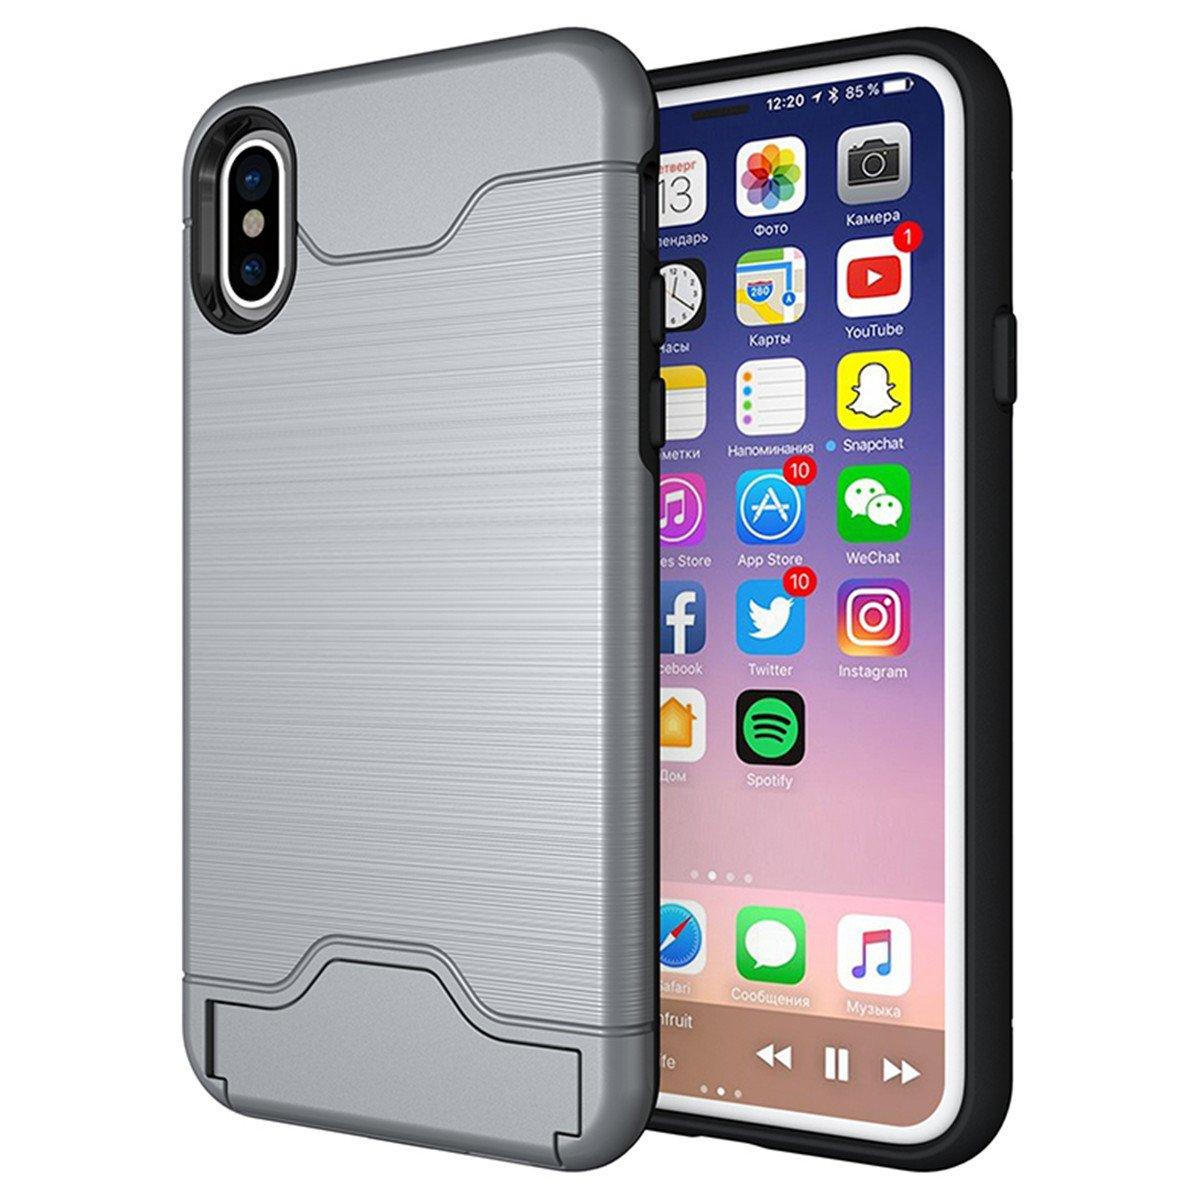 iPhone X Card Case, Lifeepro Hybrid Rugged PC + Premium Soft ...